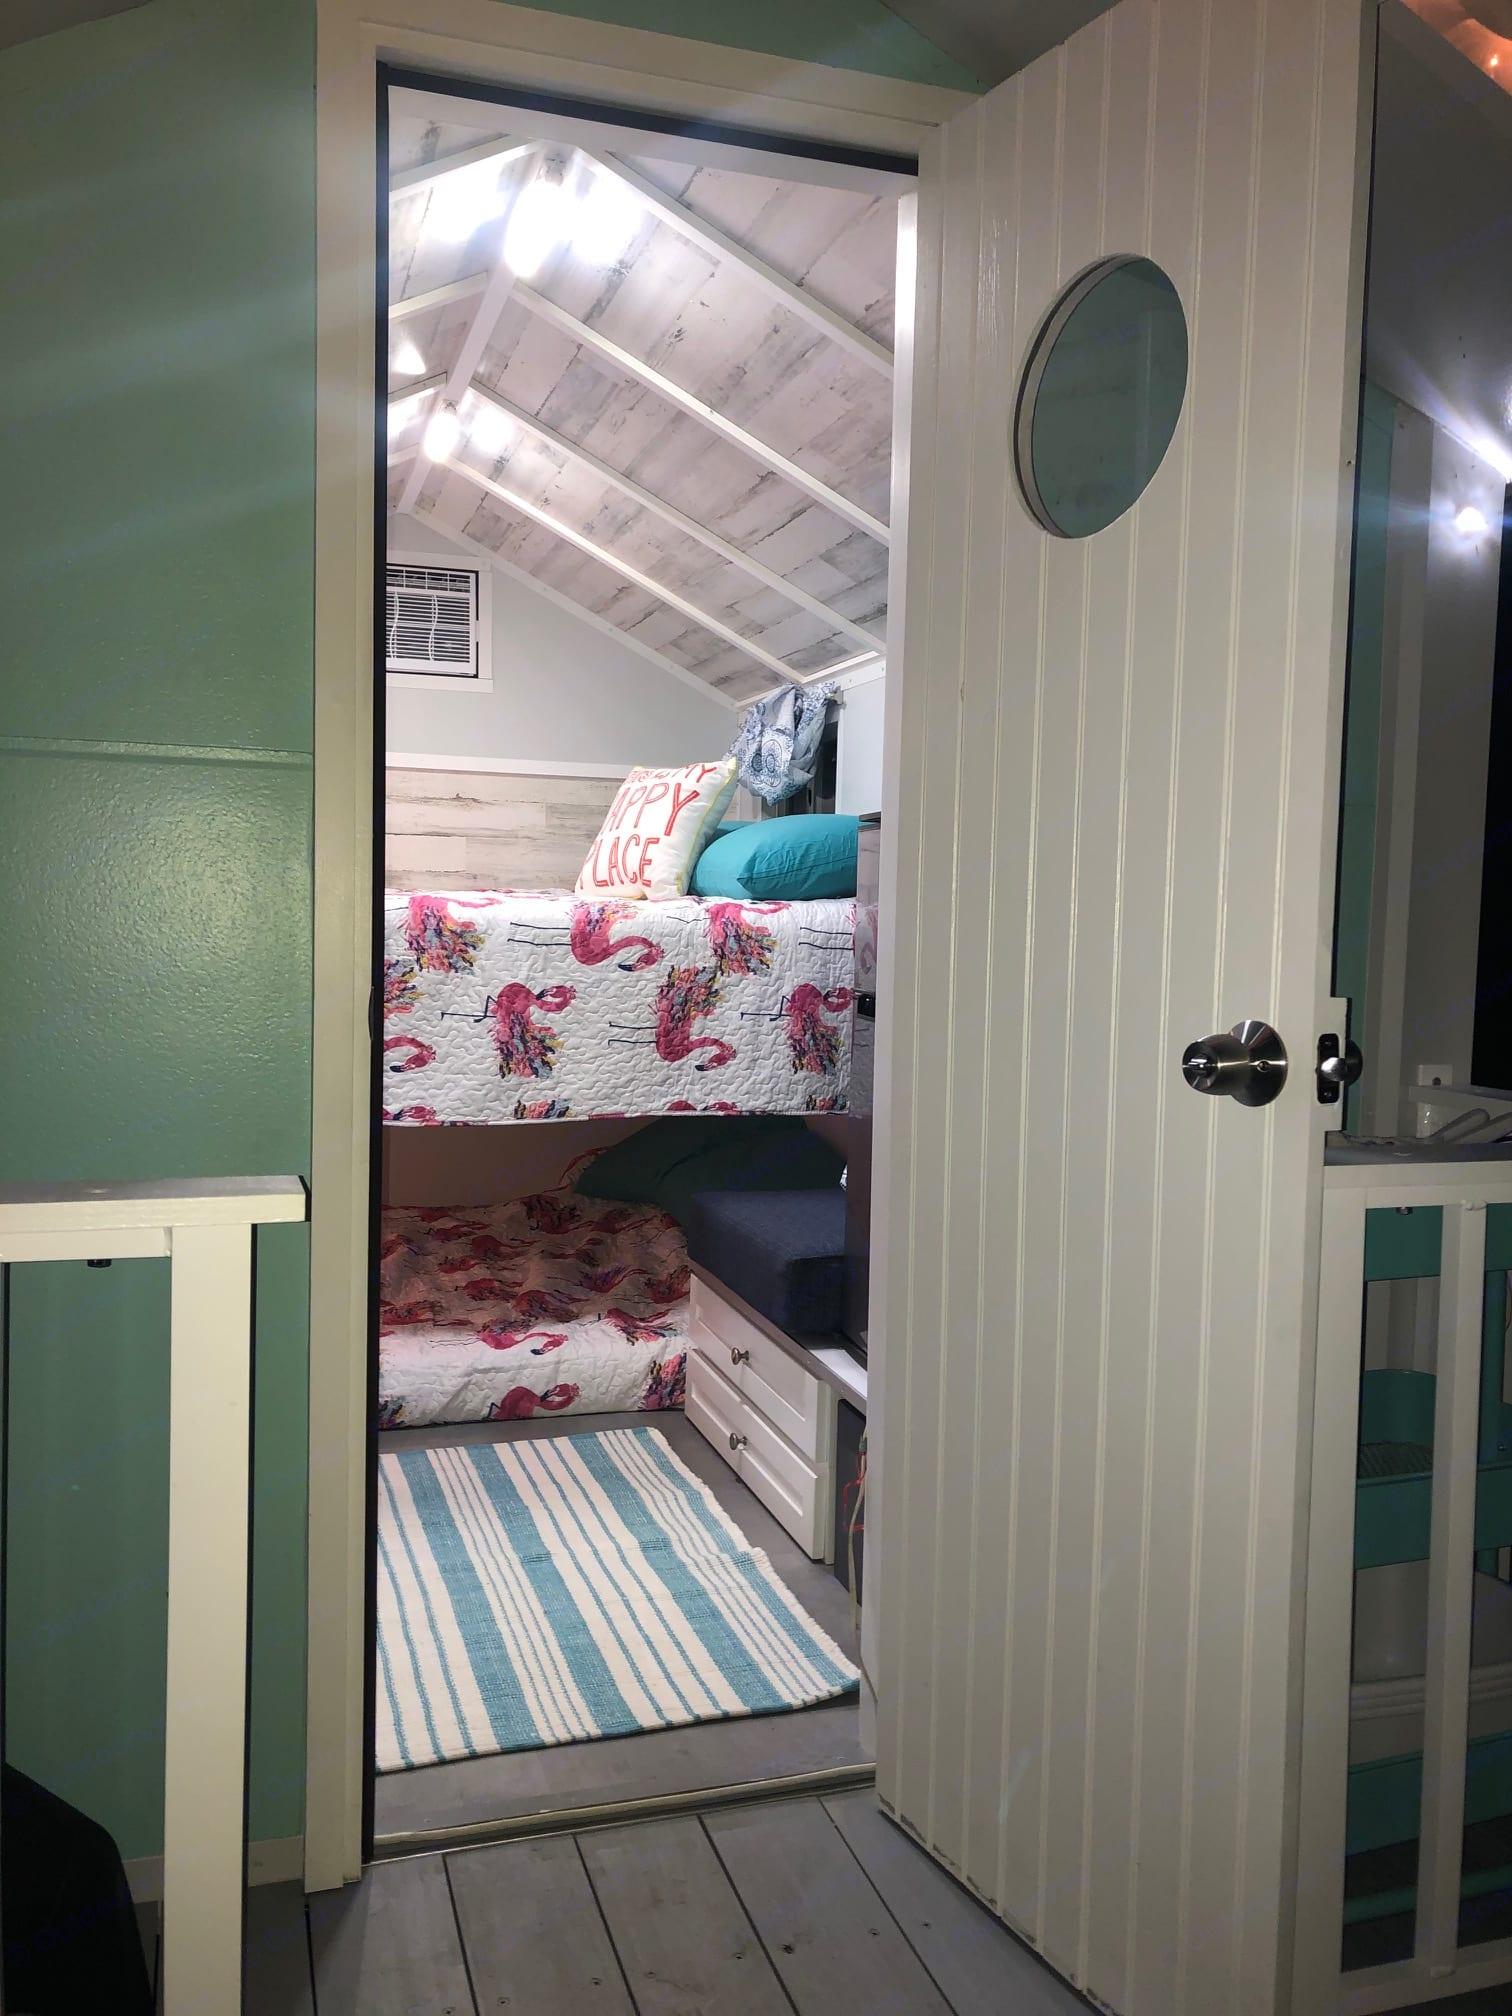 Two Queen memory foam bunk beds, adorable flamingo bedding. Core Housing Solutions Beach House 2019